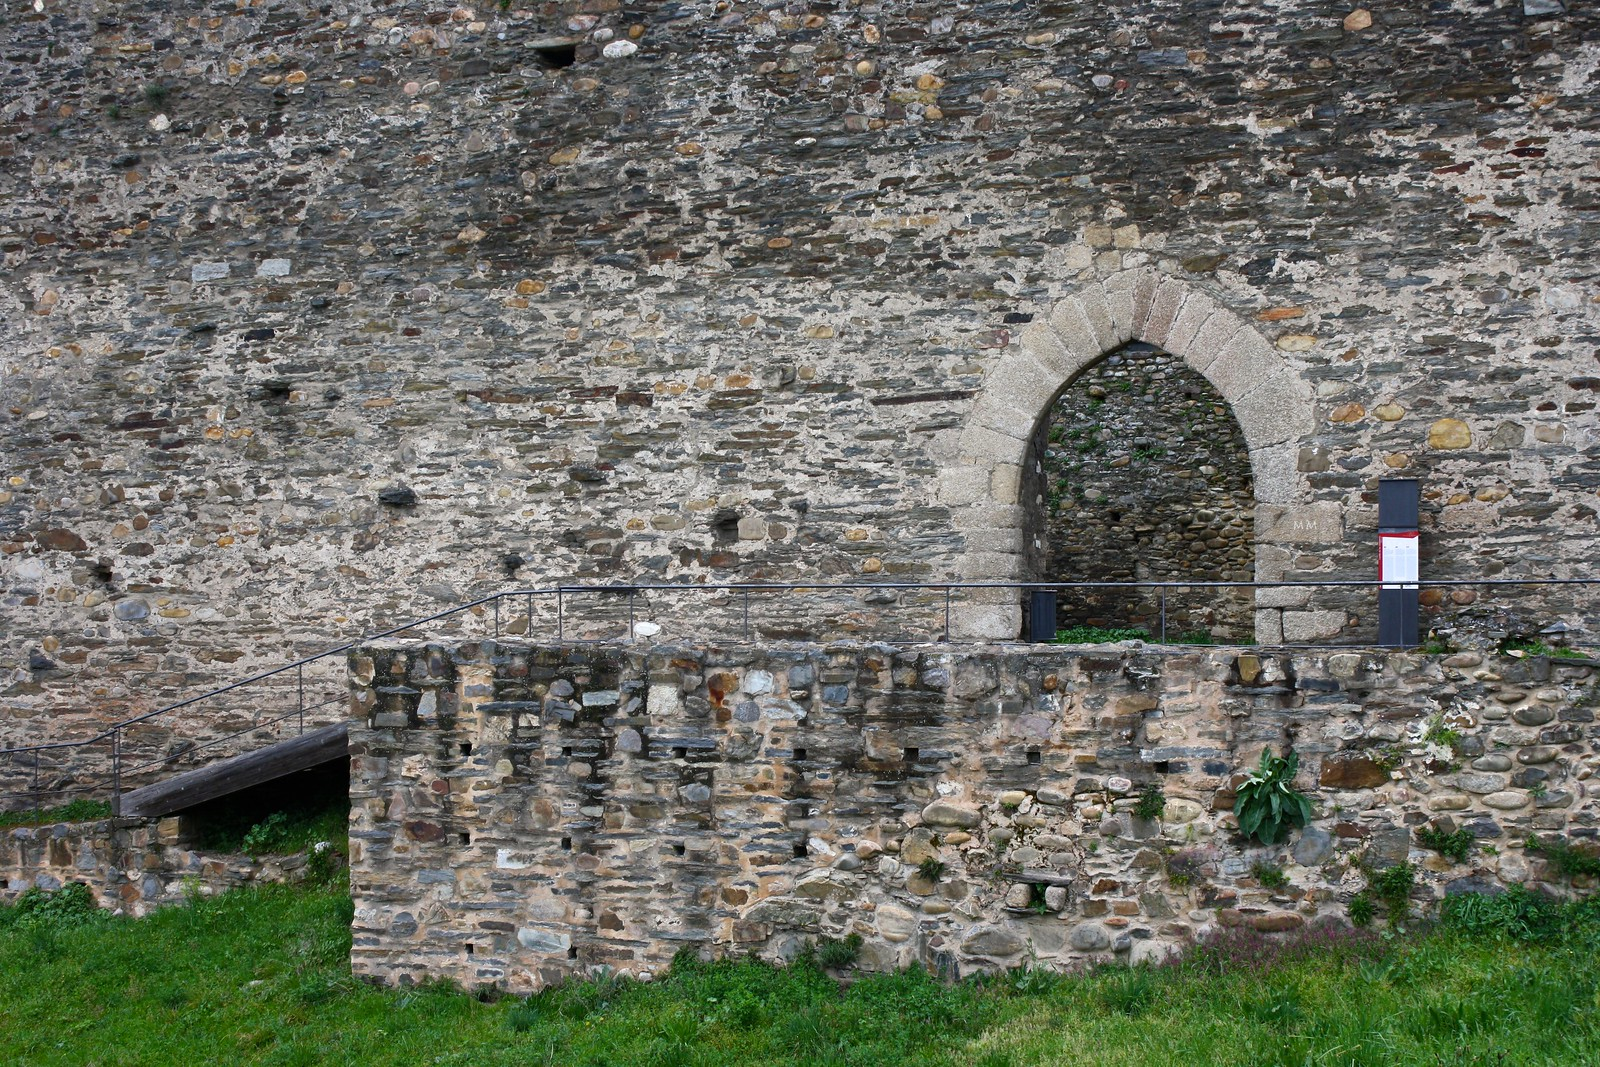 Knights Templar Castle, Ponferrada, Spain